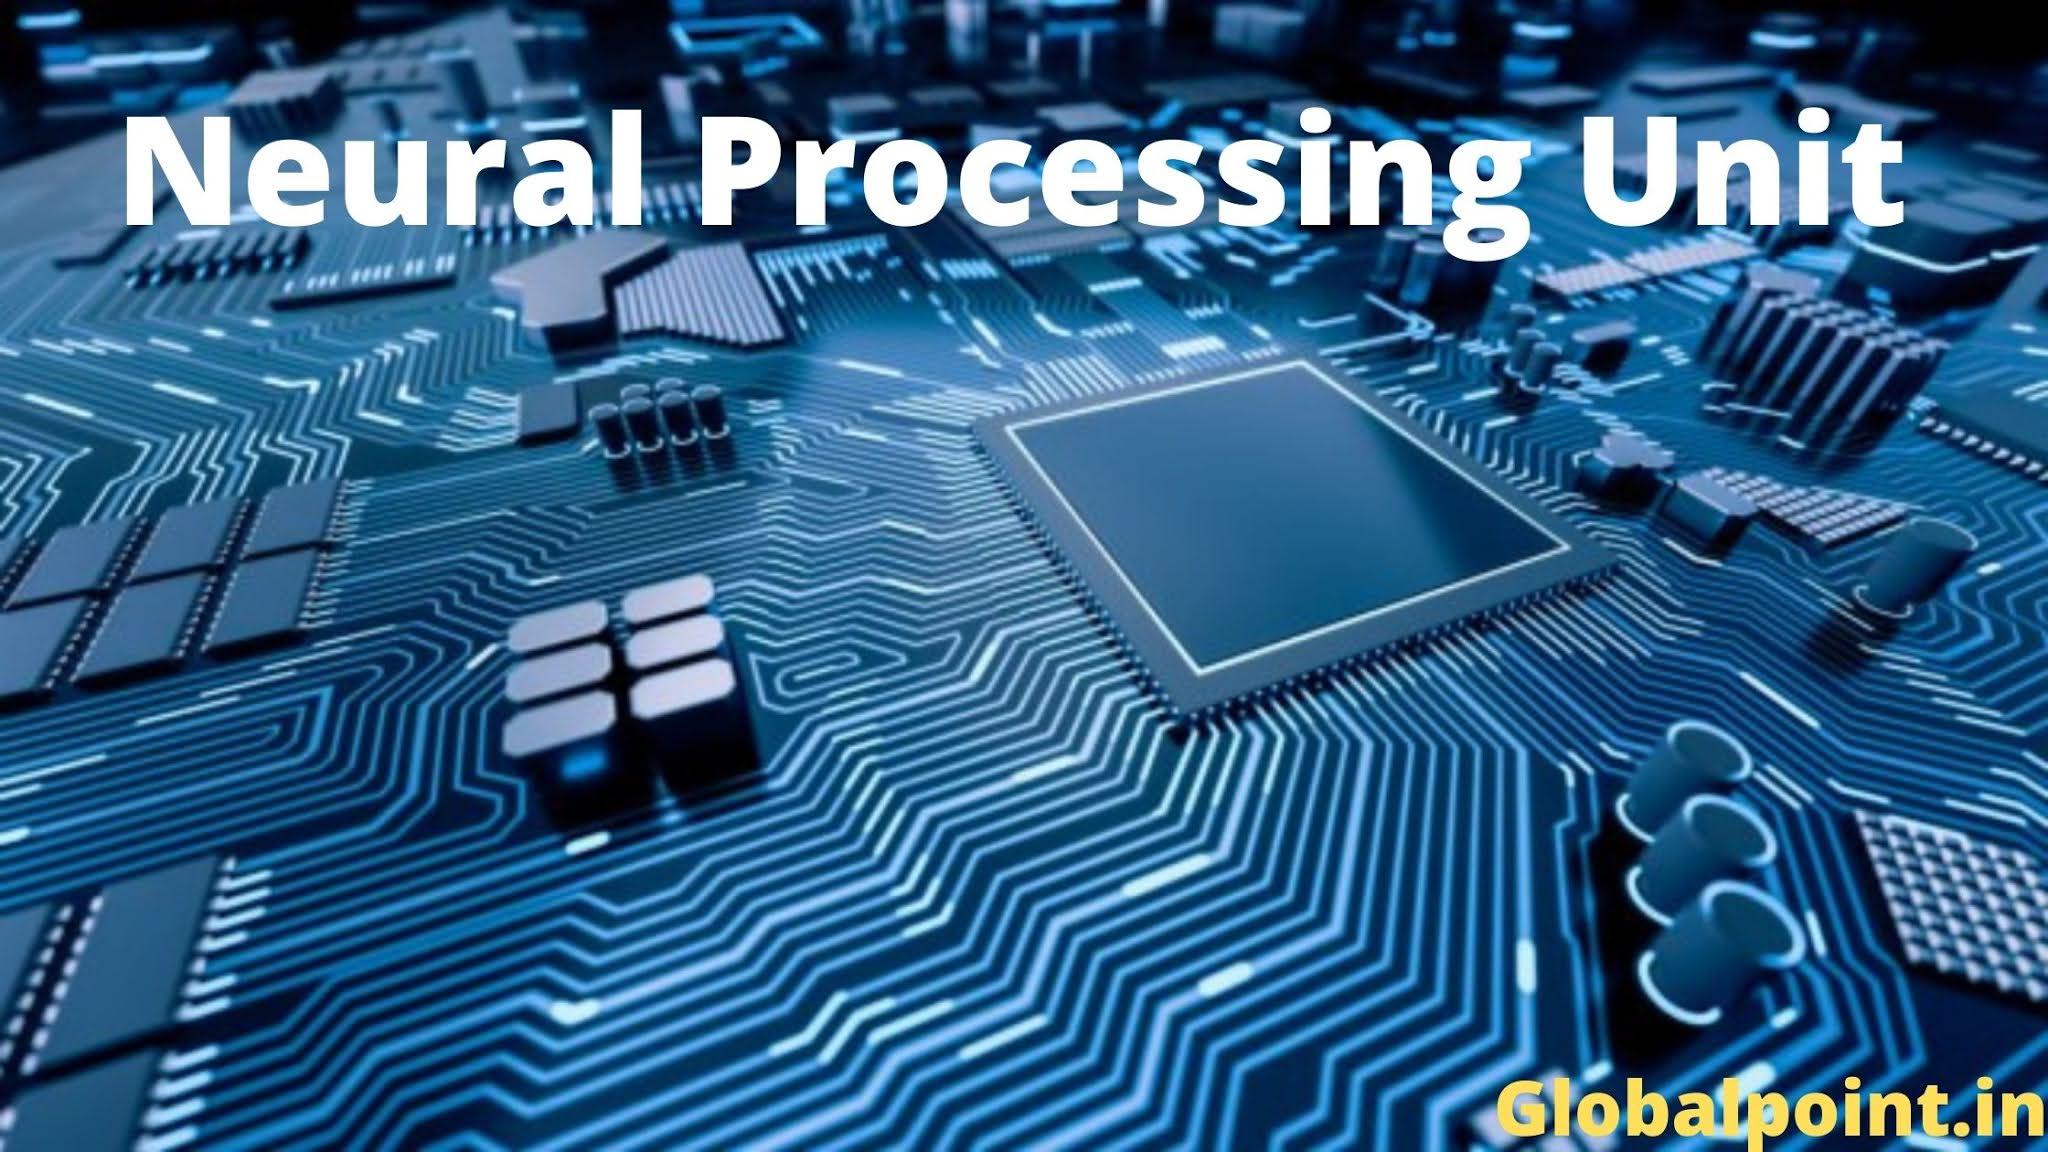 Neural Processing Unit